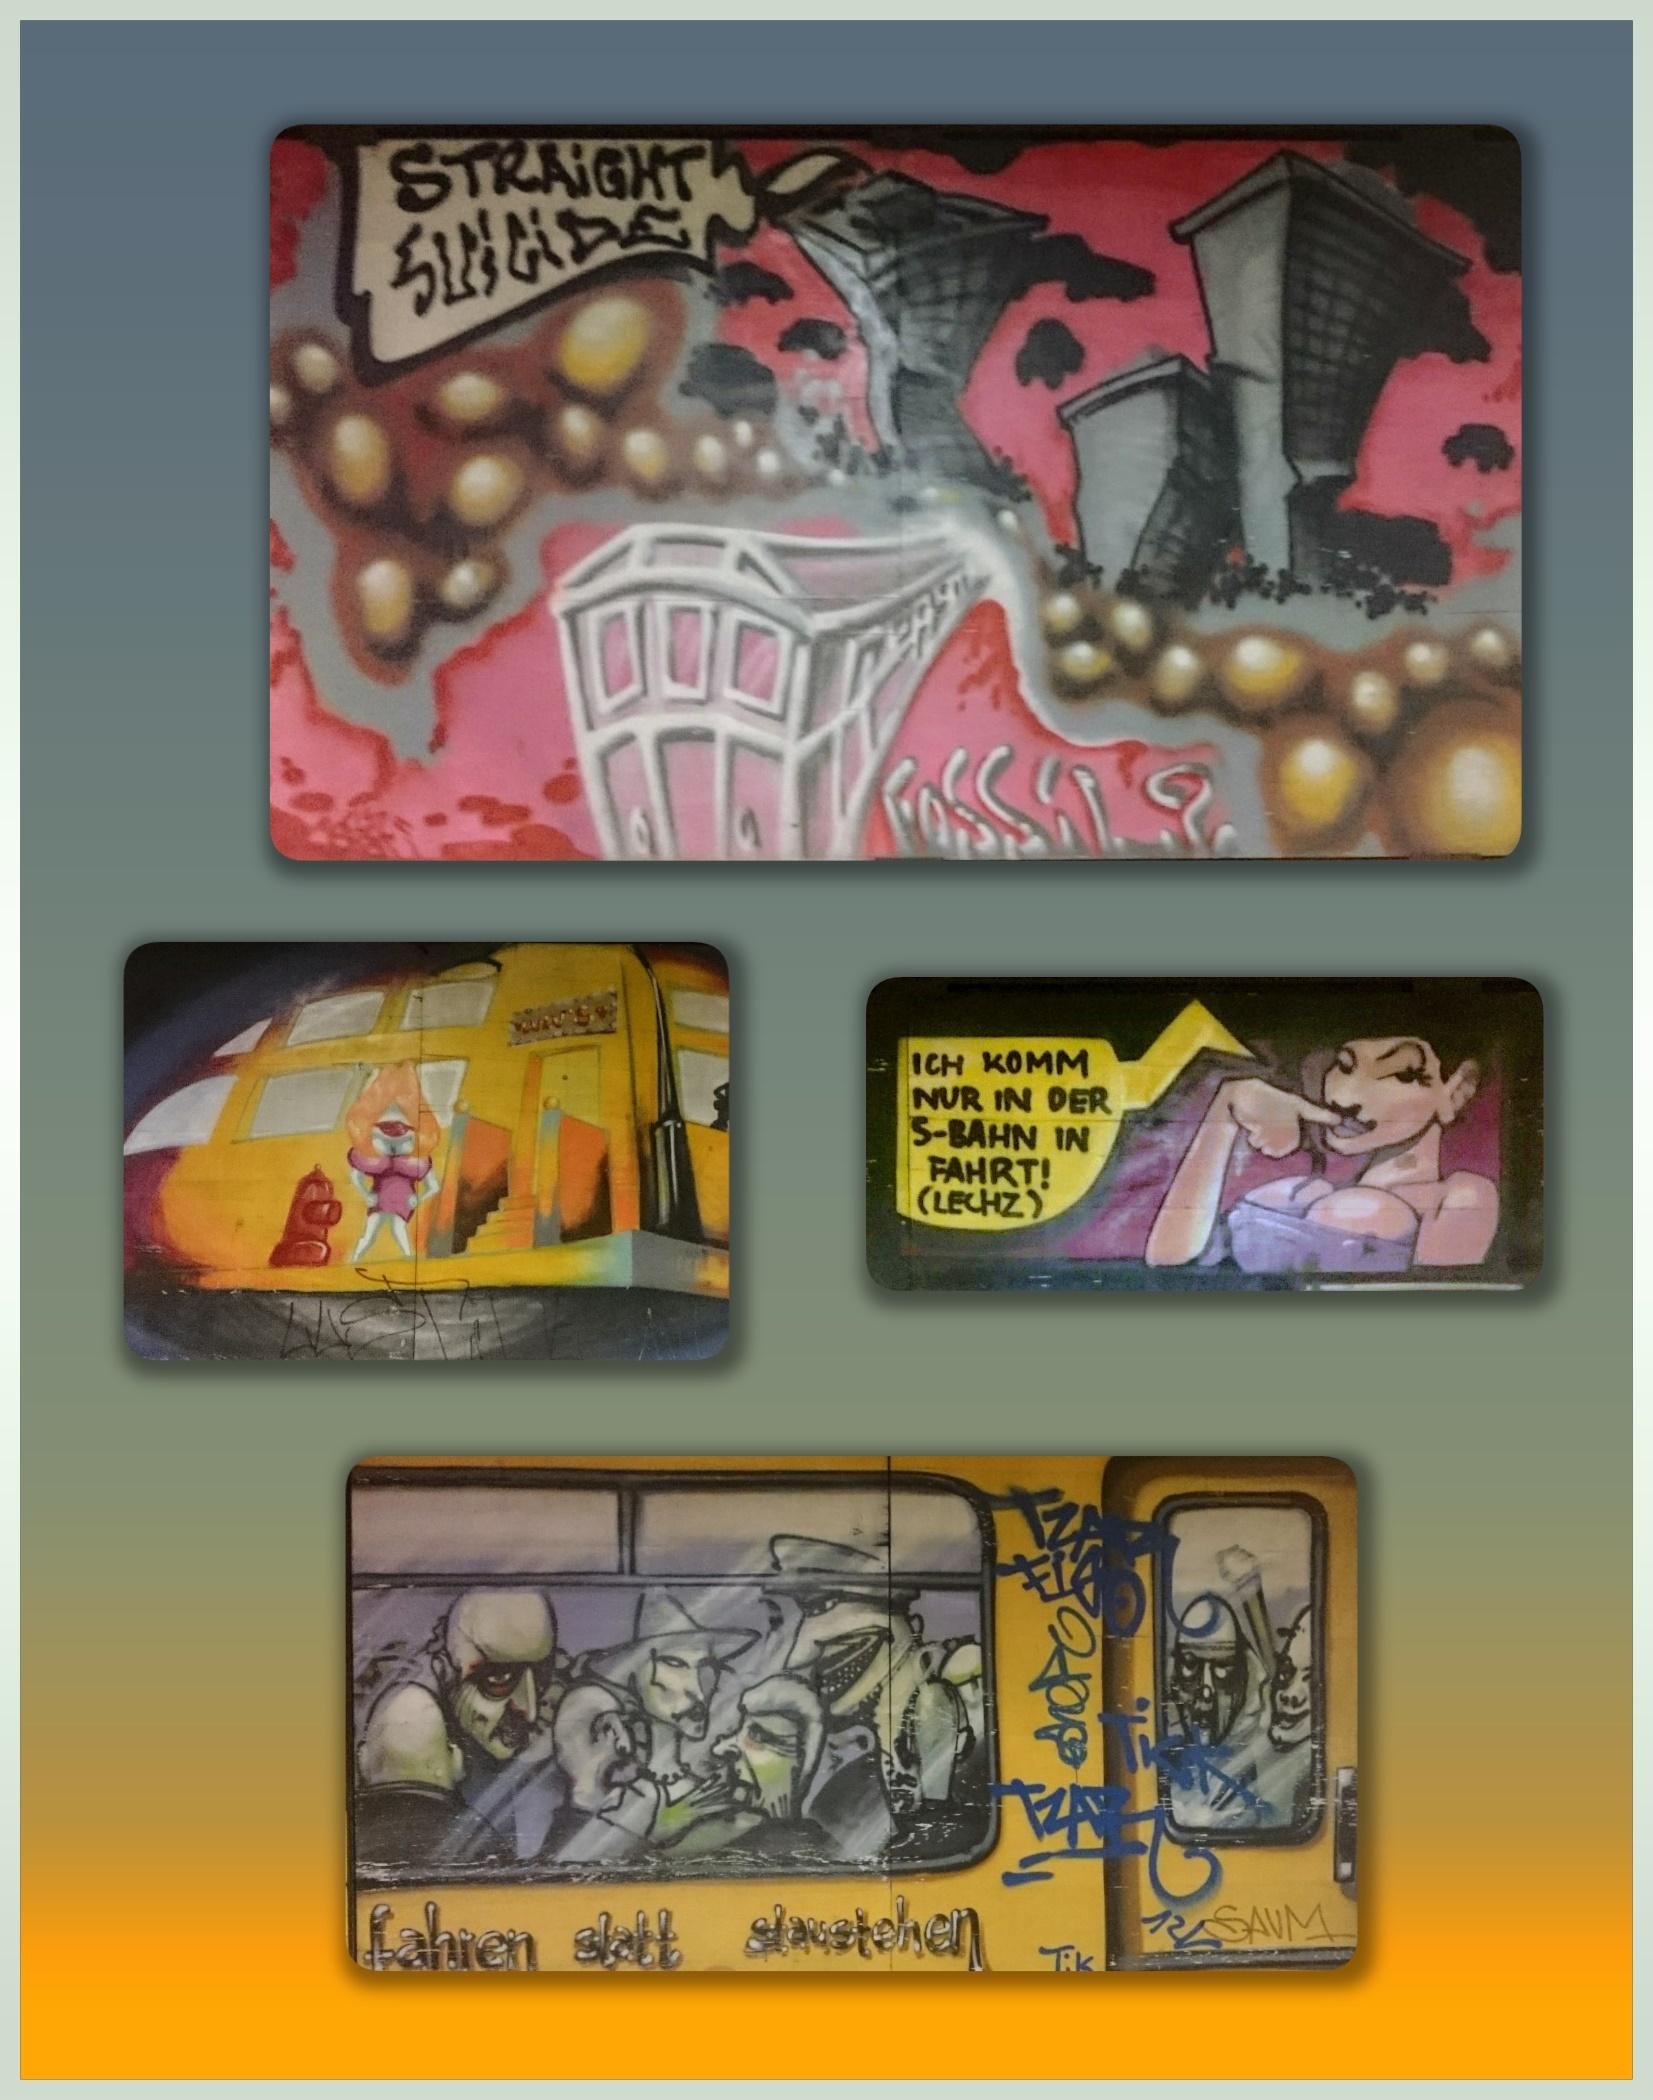 s-bahn-collage-3